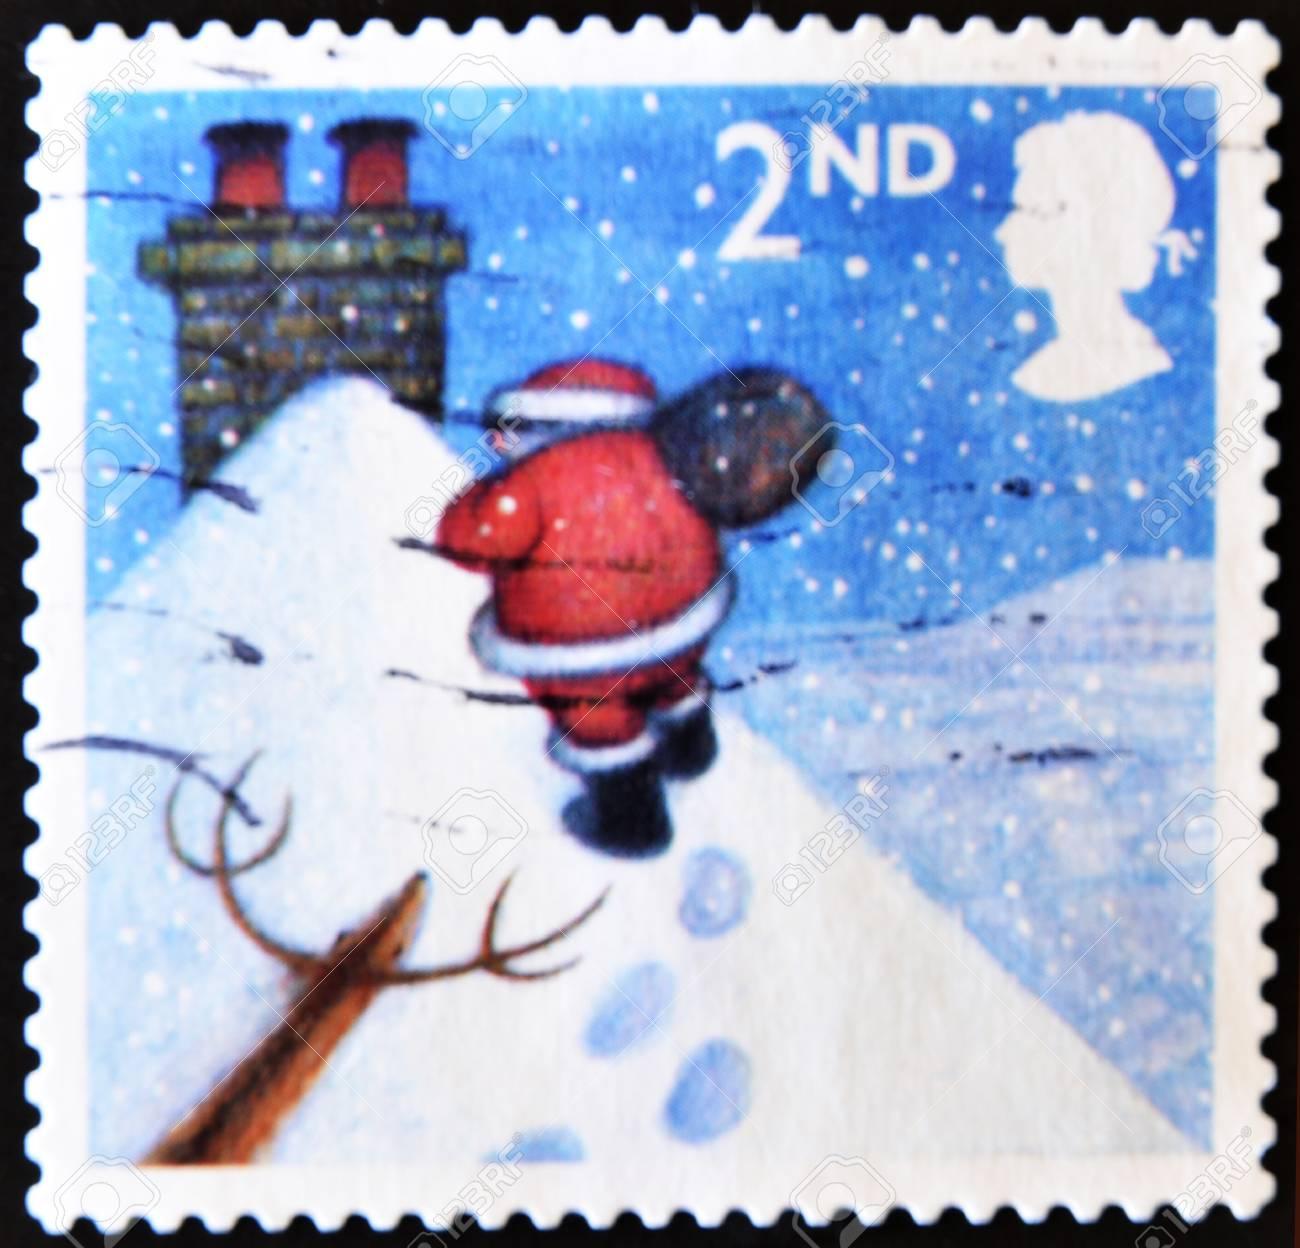 UNITED KINGDOM - CIRCA 2004: A stamp printed in England, shows Santa Claus, walking toward chimney in snow, circa 2004 Stock Photo - 11099013